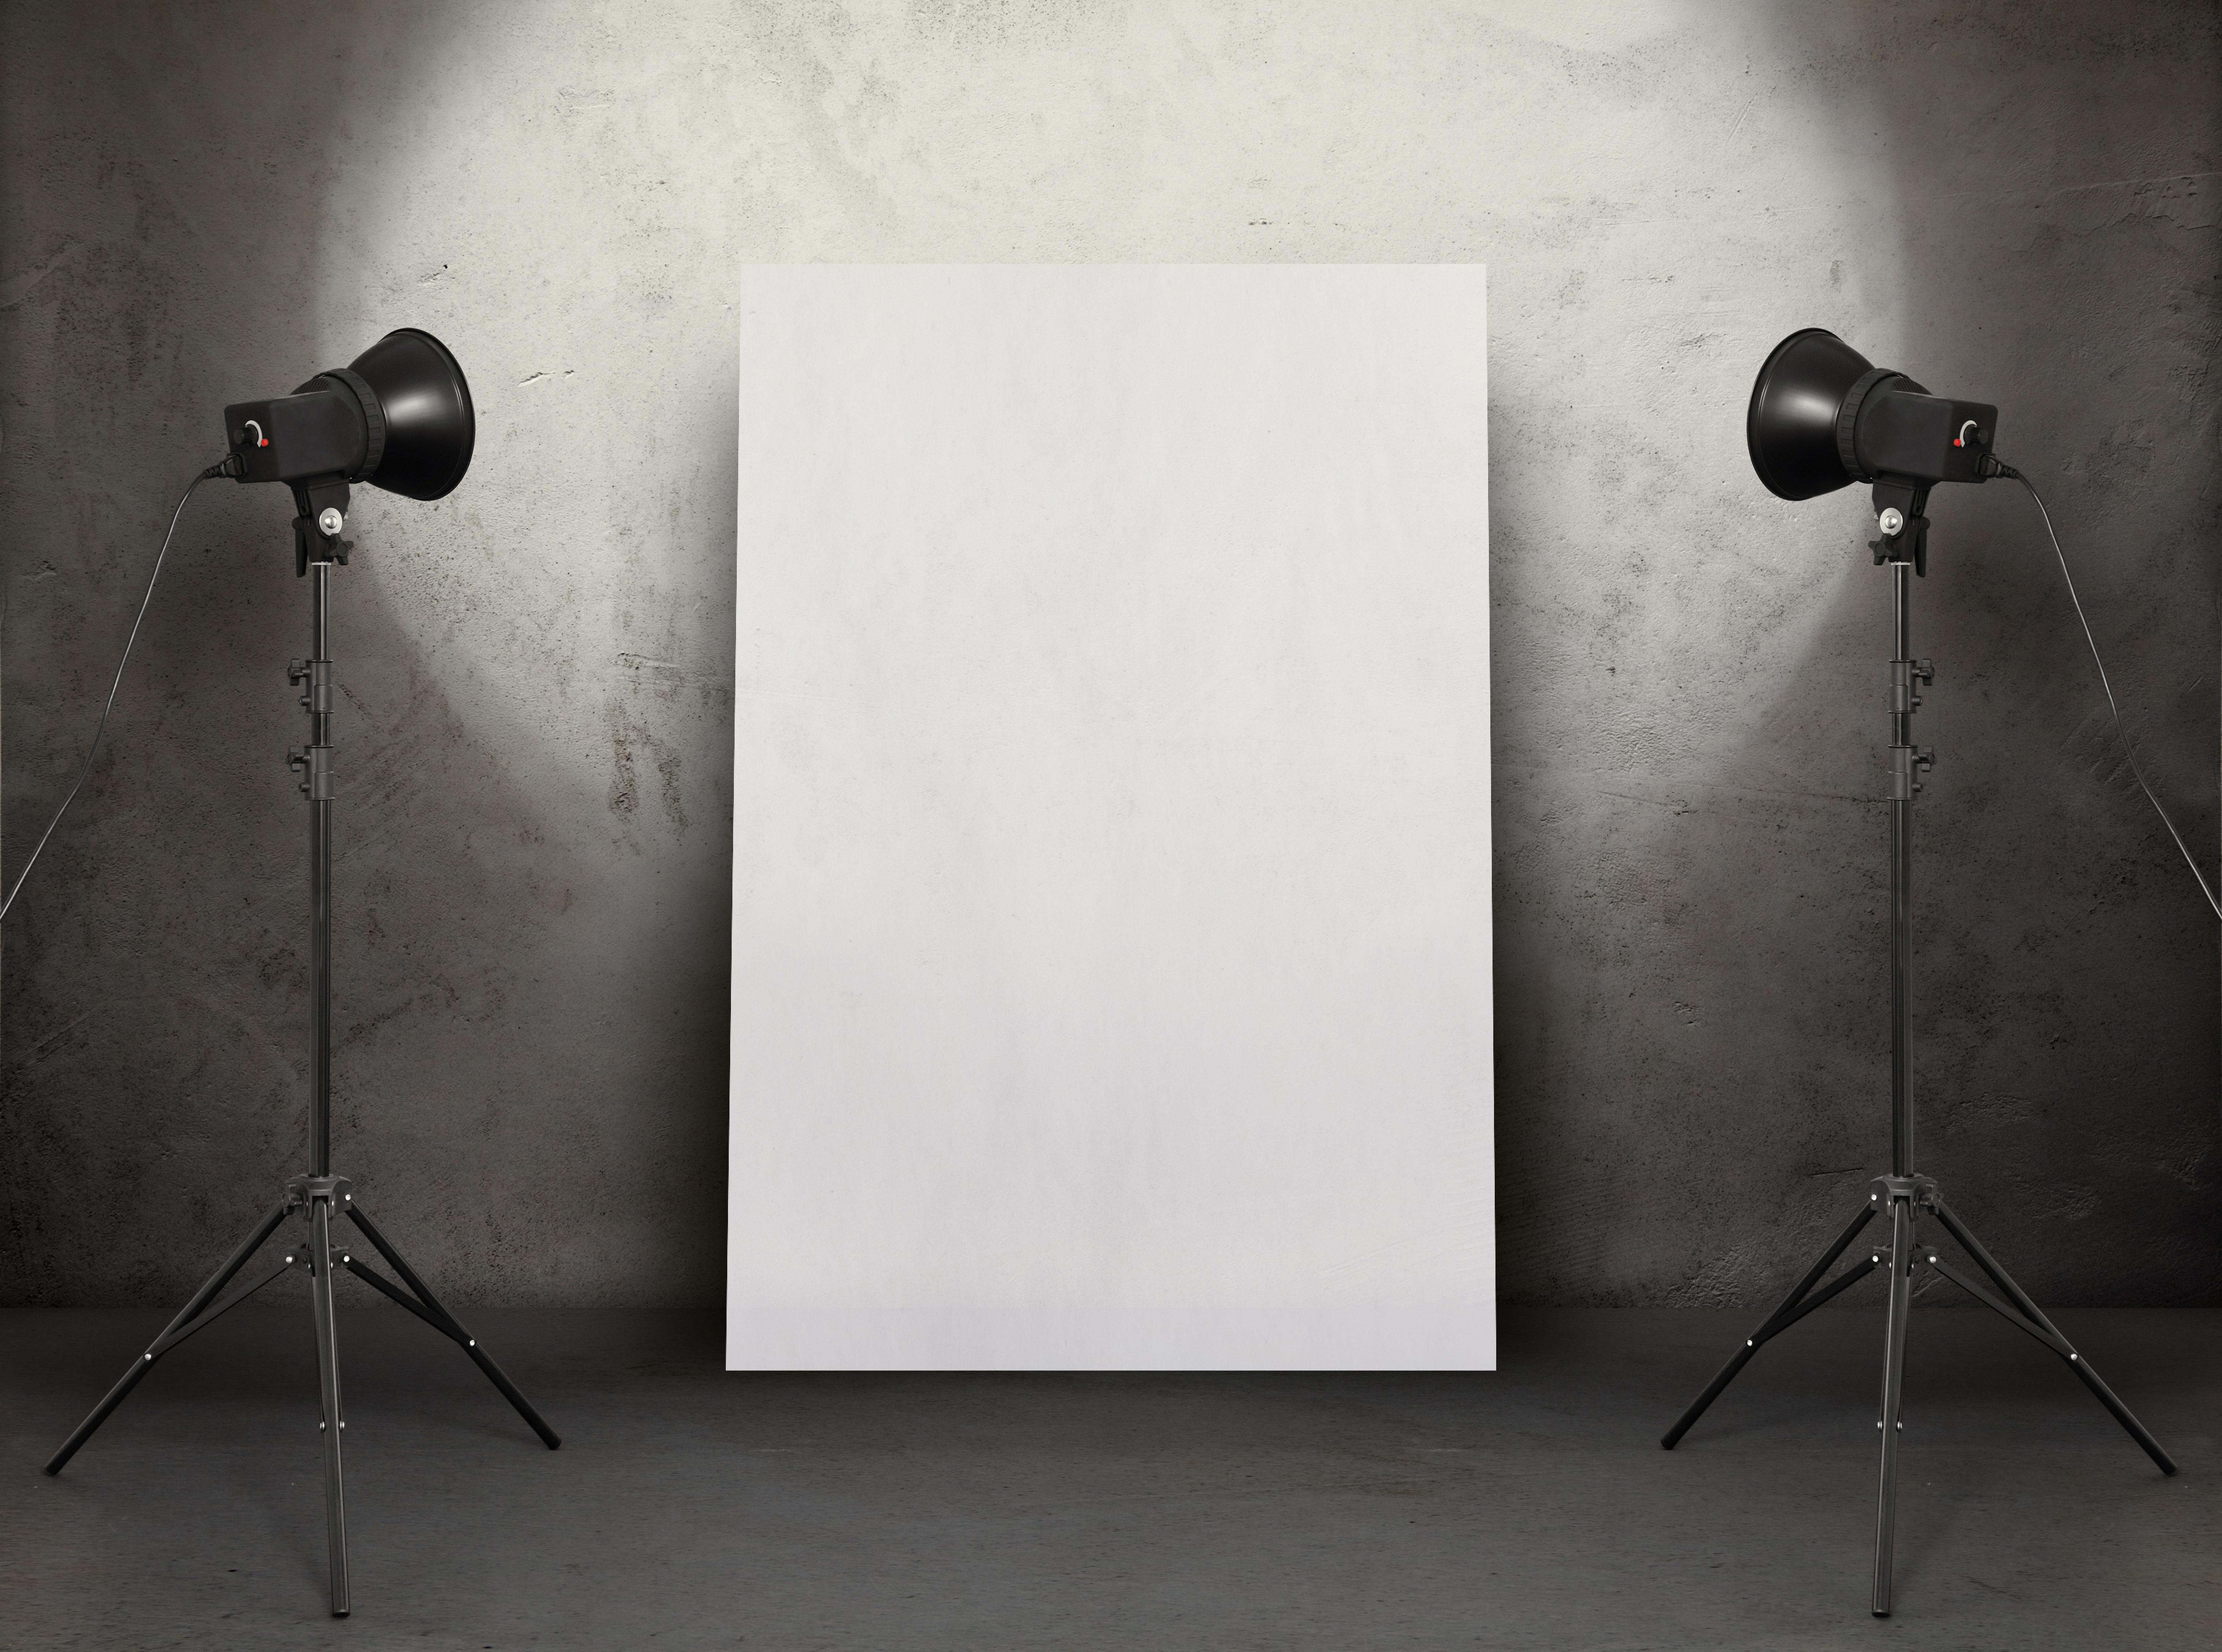 Artistic Frame 6080x4520